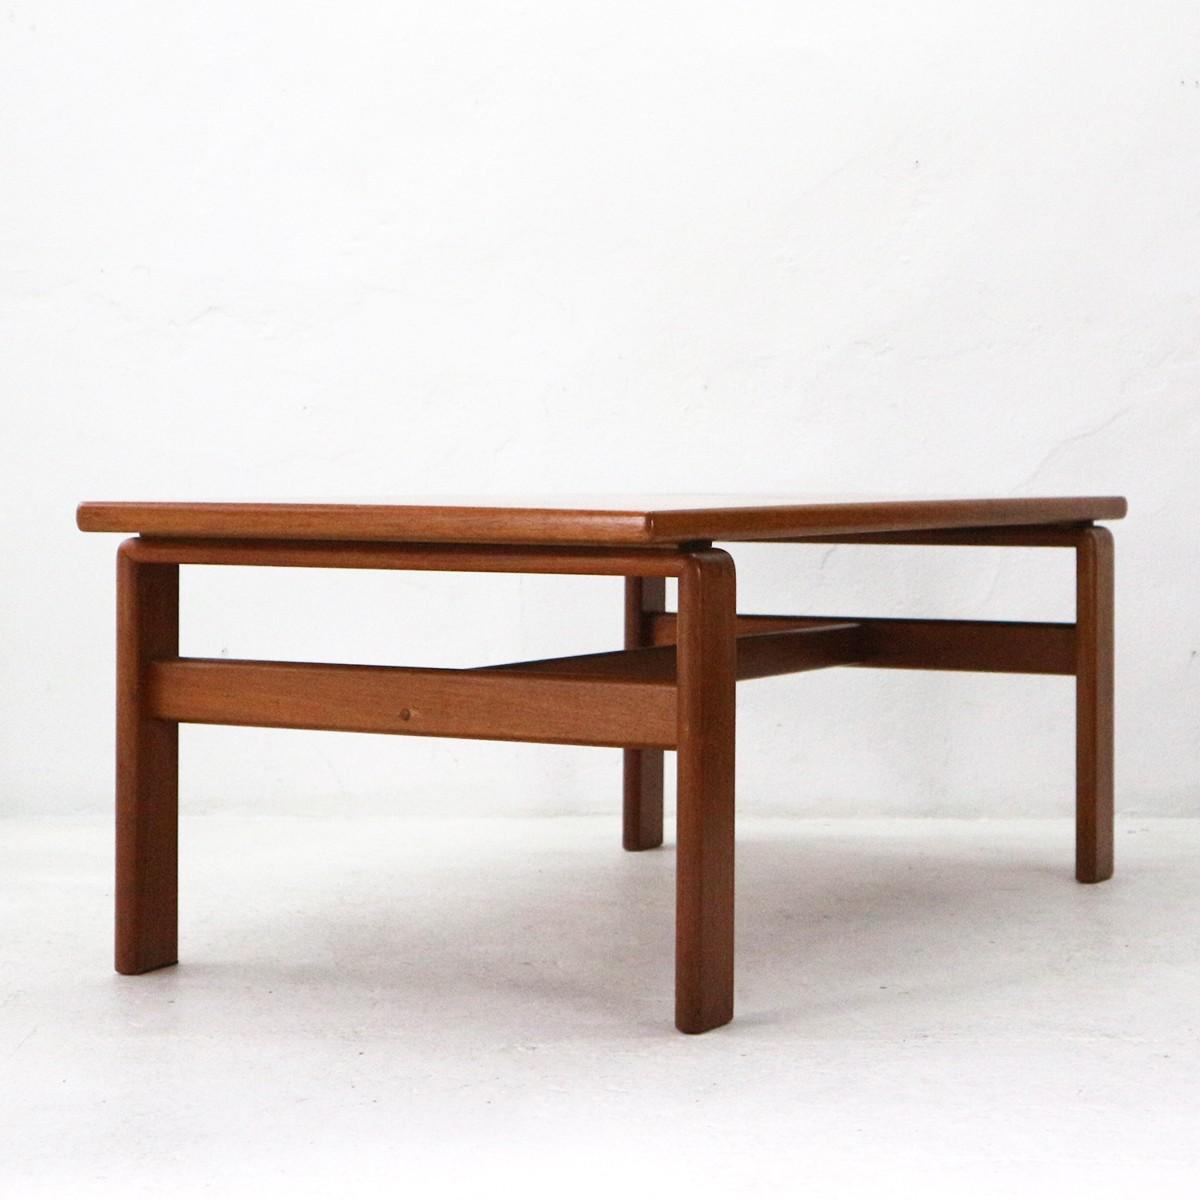 Vintage Danish Teak Coffee Table - 1970s - Design Market